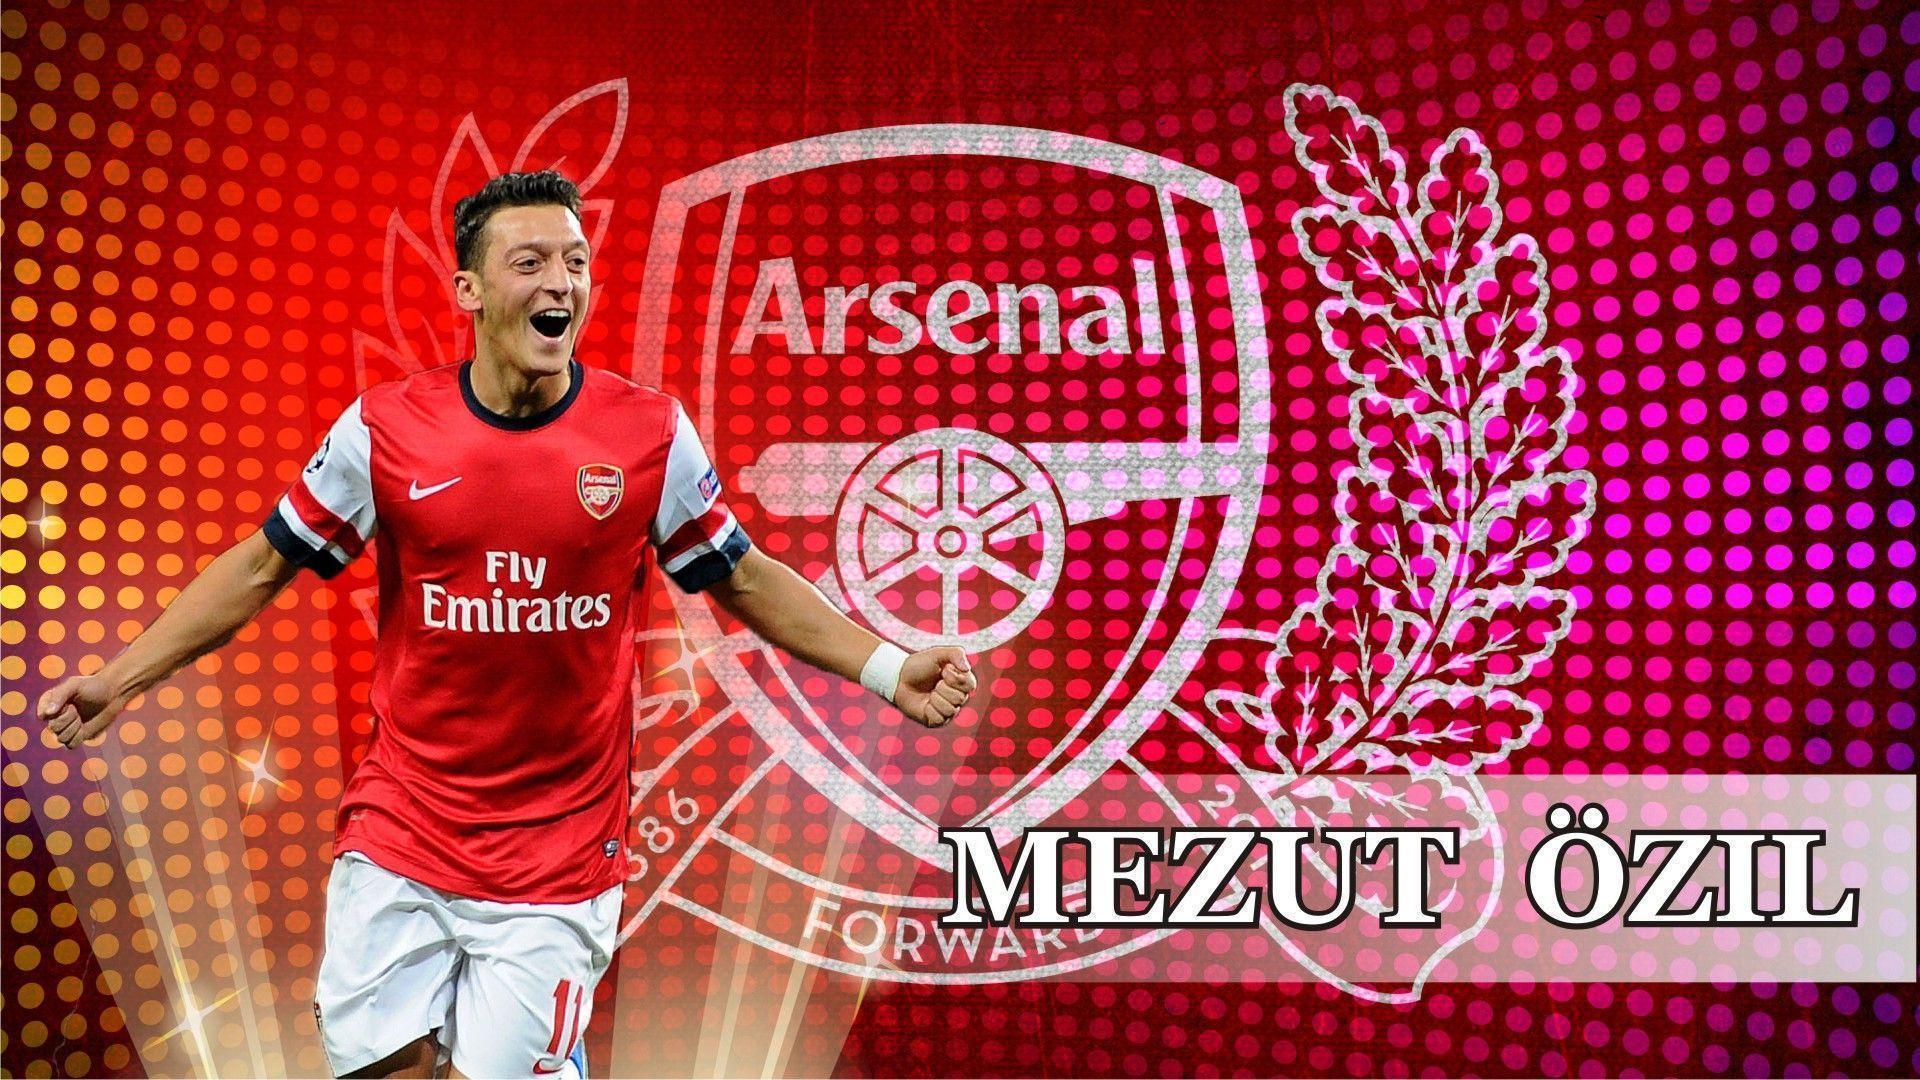 Arsenal Logo Wallpapers 2016 1920x1080